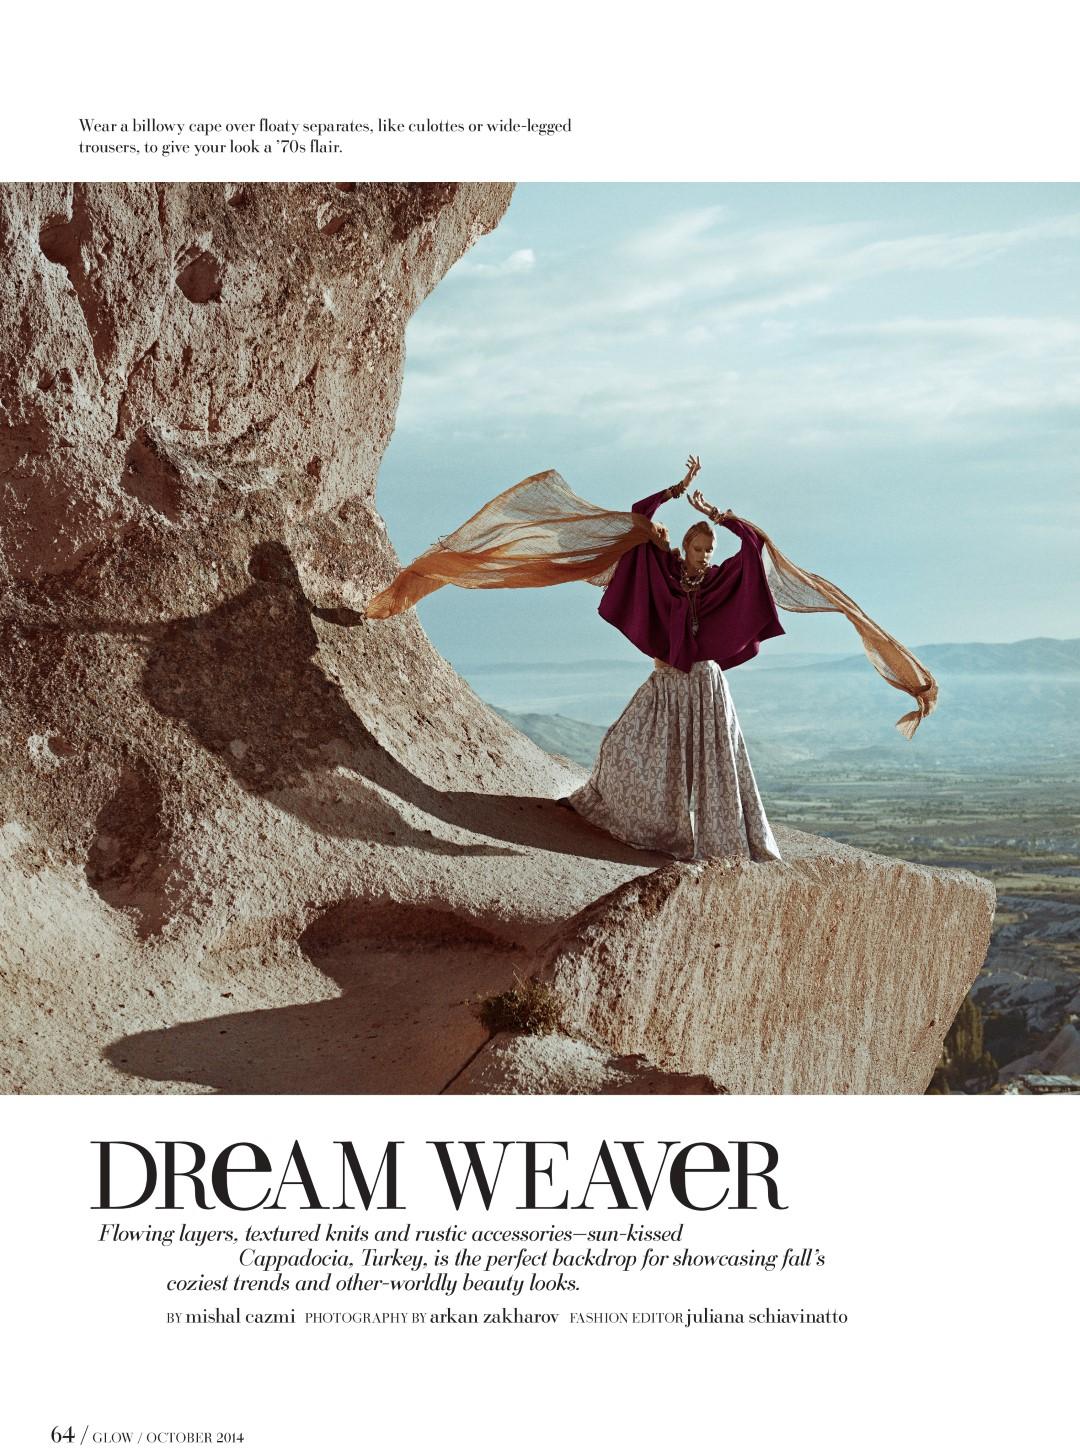 Glow Magazine Dream Weaver Cappadocia